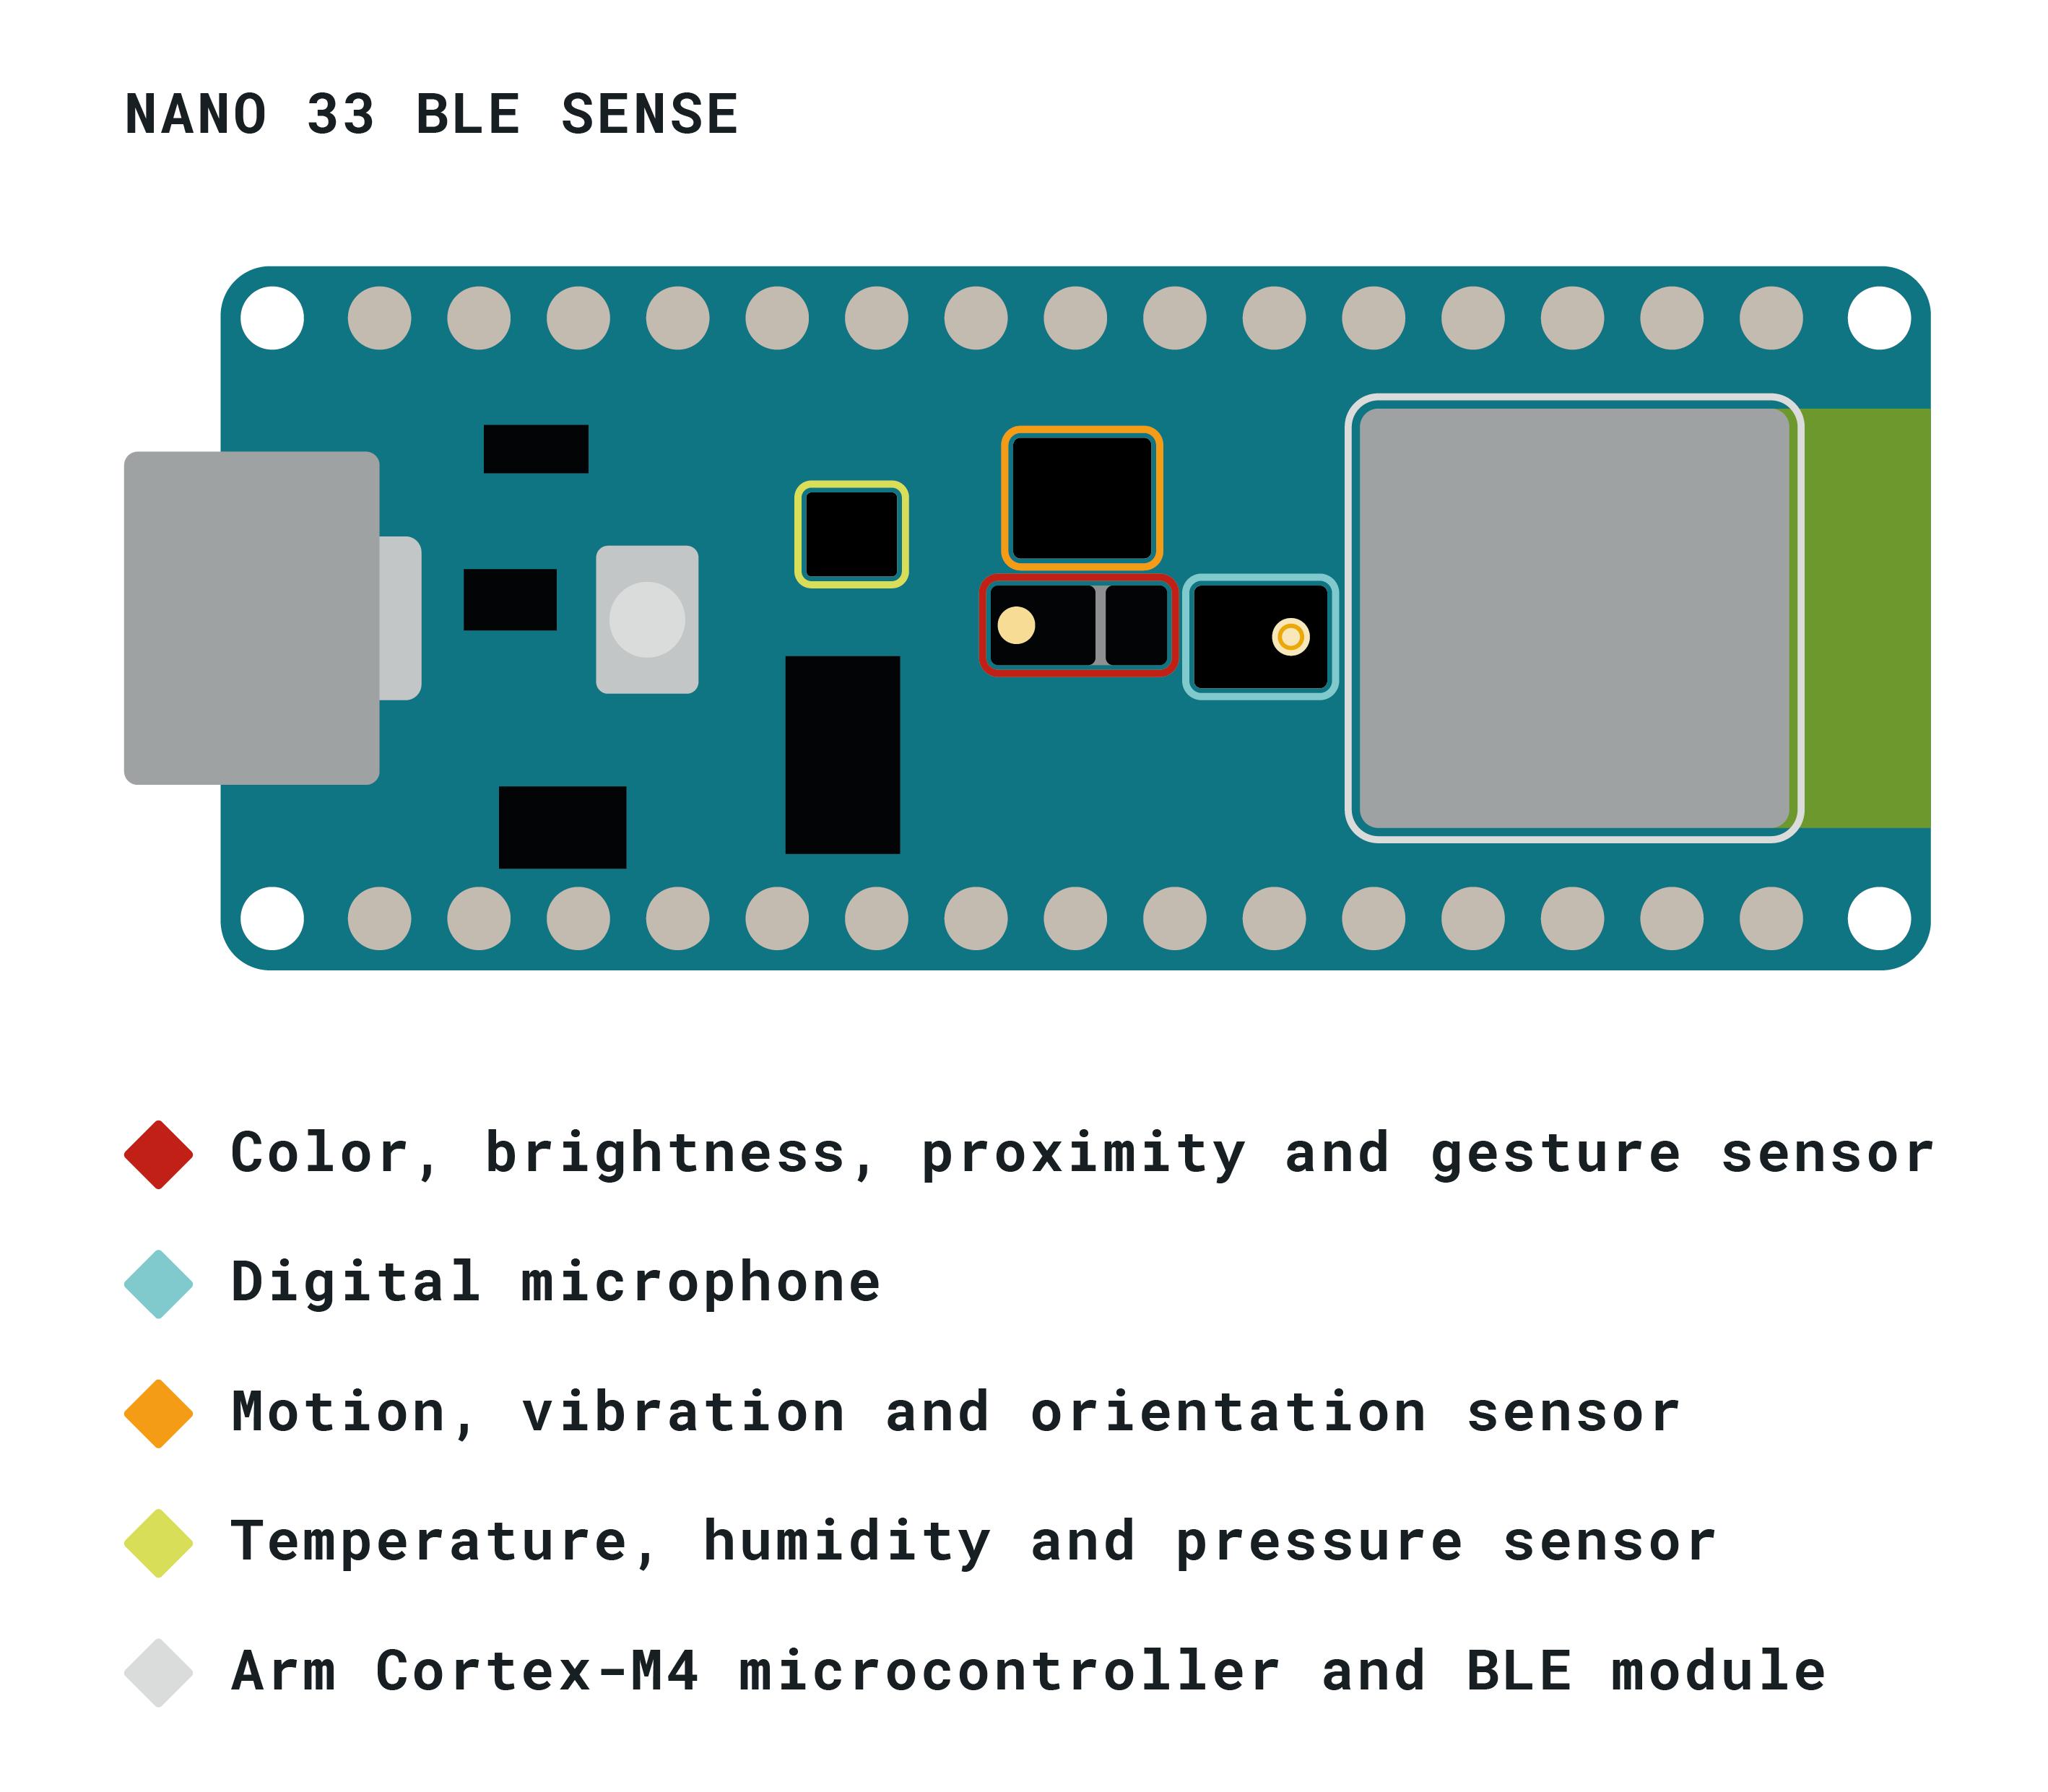 Arduino NANO 33 BLE Sense Sensors